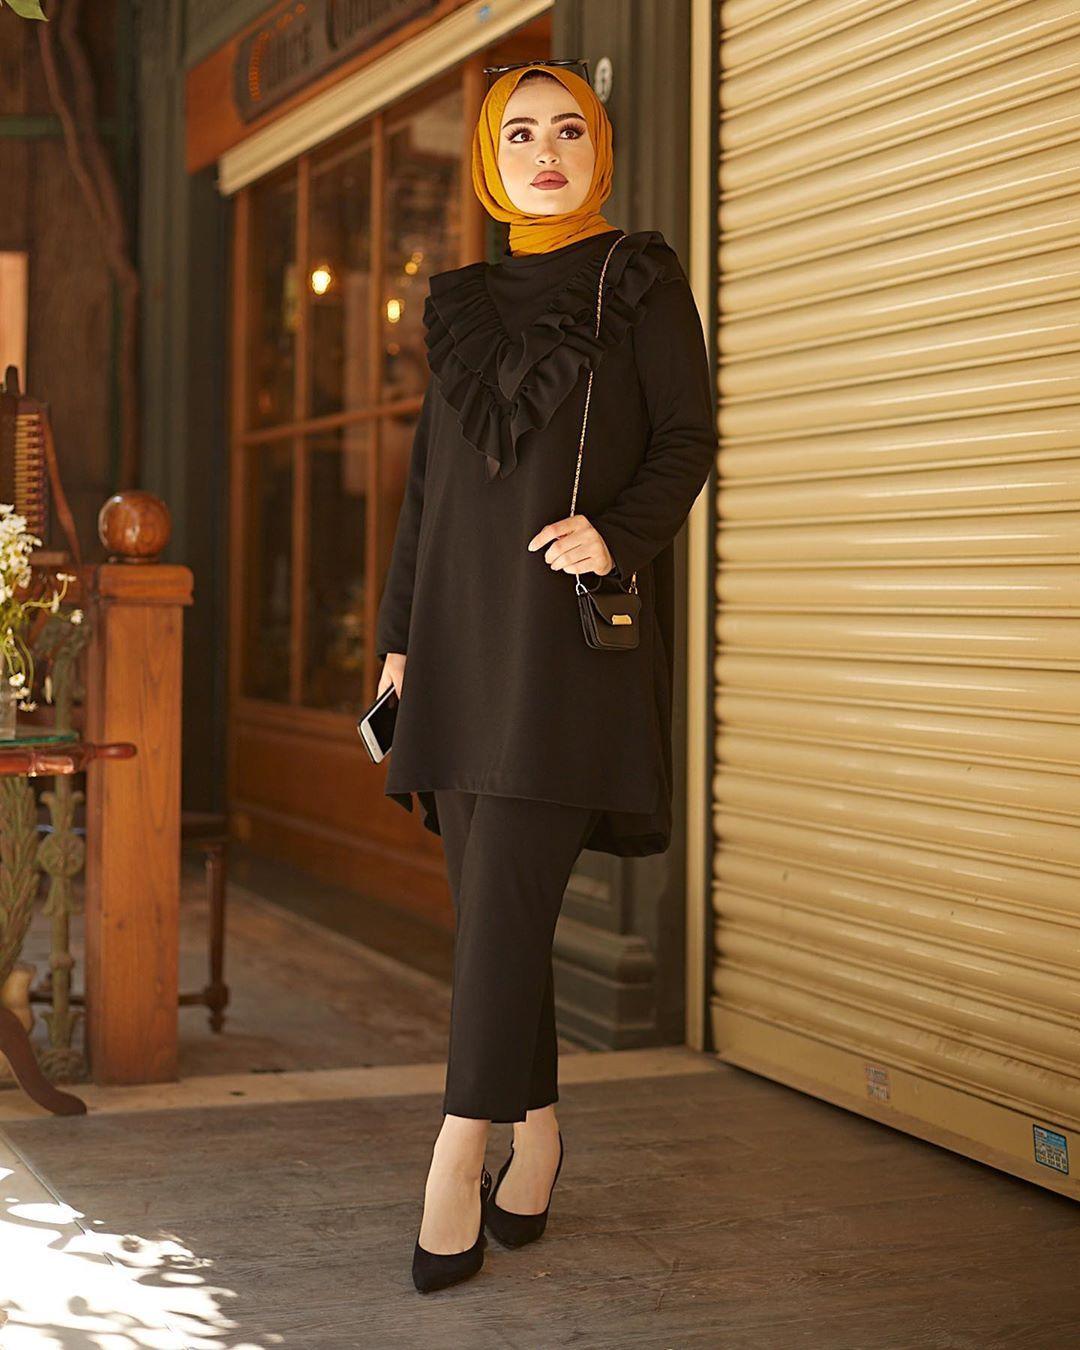 Madia Adli Kullanicinin Hijab Modest Outfit Inspo Panosundaki Pin 2020 Moda Kombinleri Moda Urunler